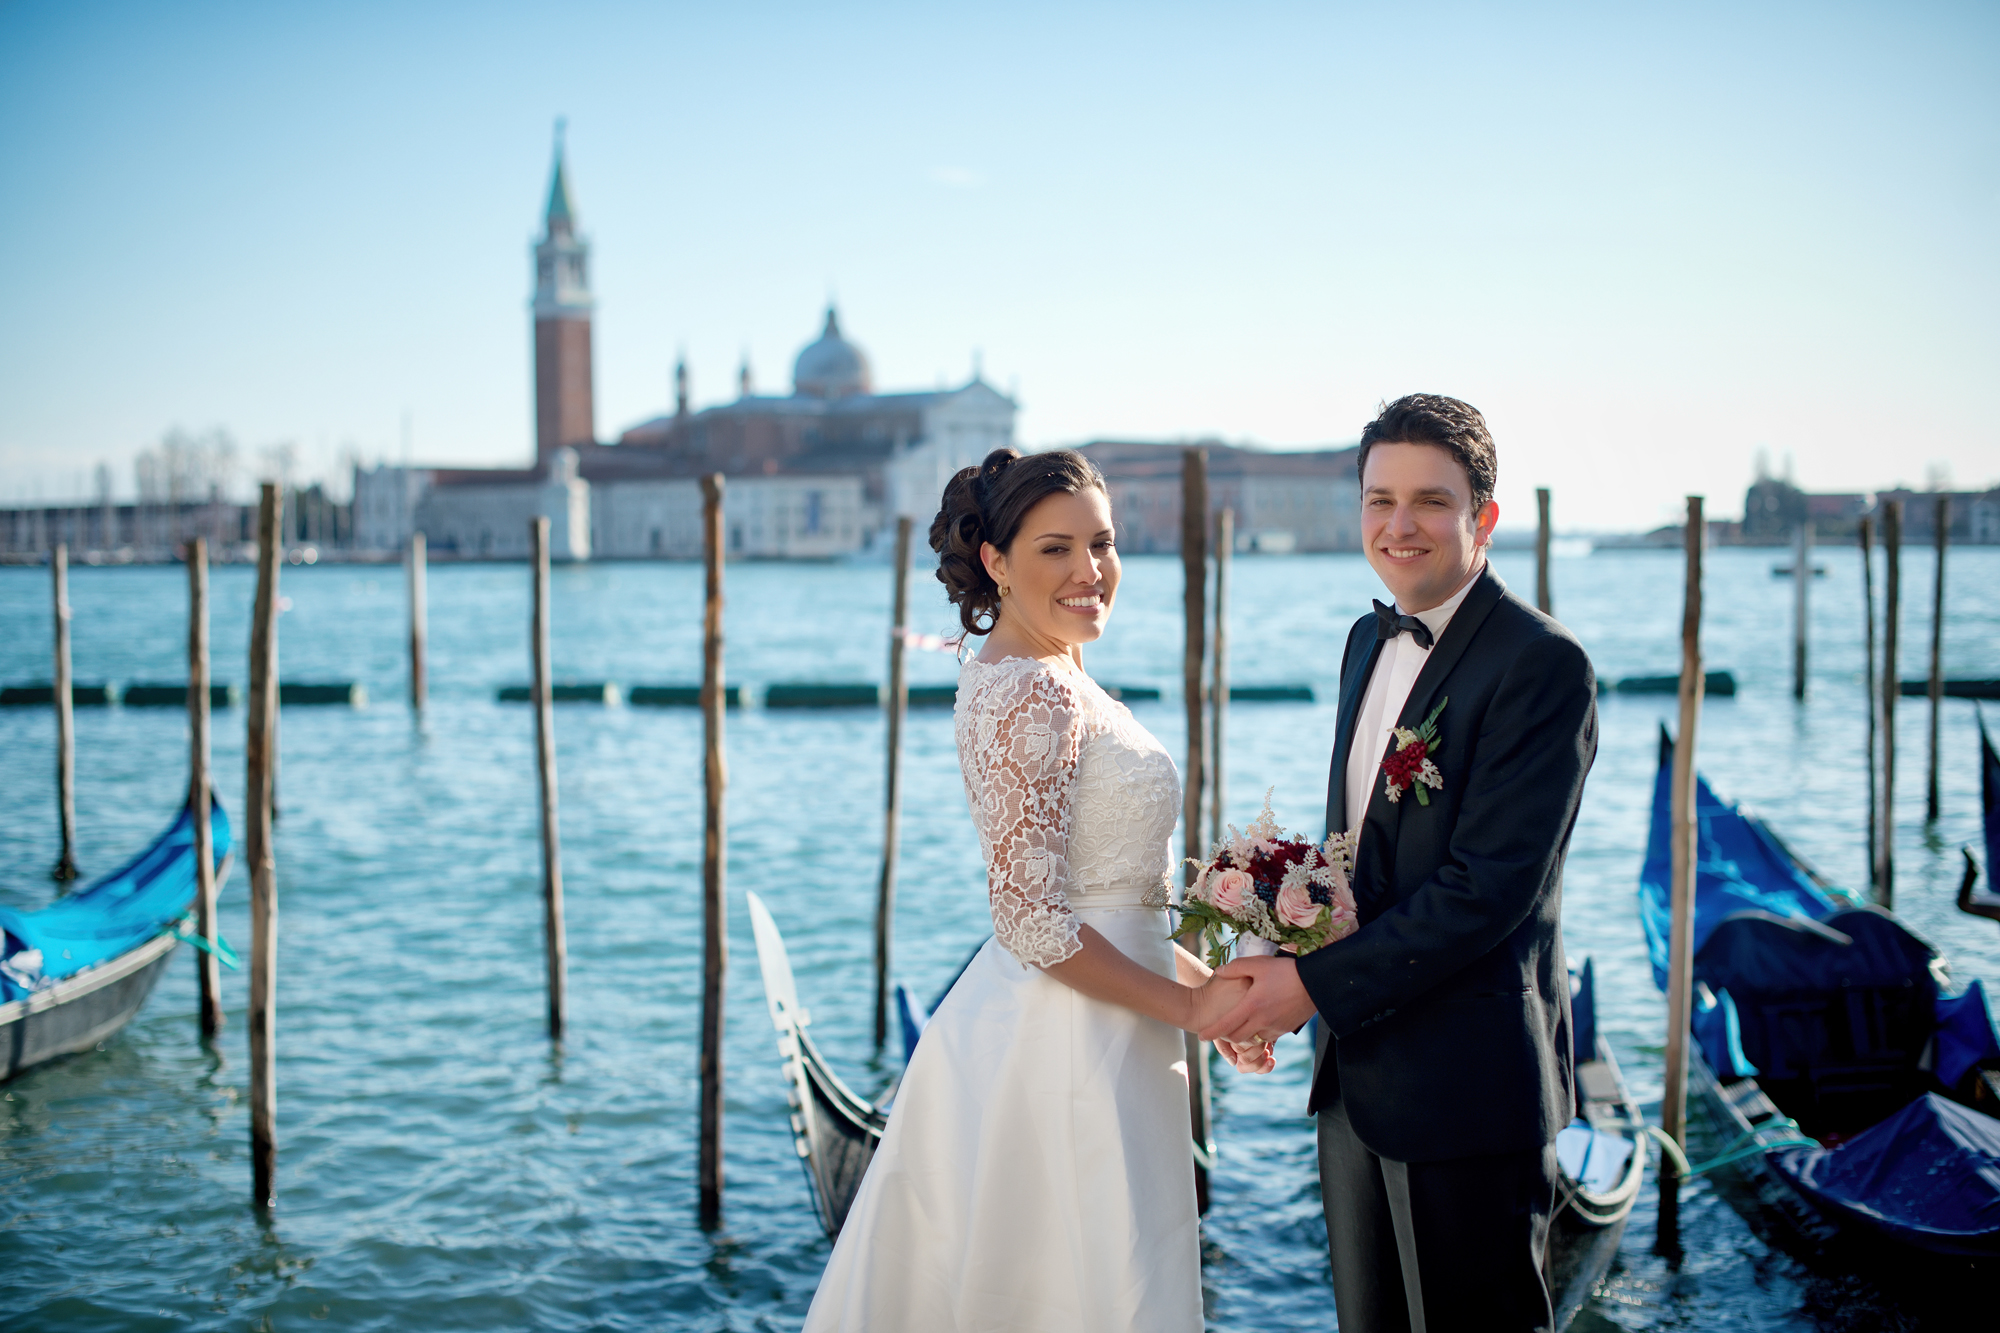 venezia matrimonio simbolico fotografia carmini laure jacquemin fotografo (75)